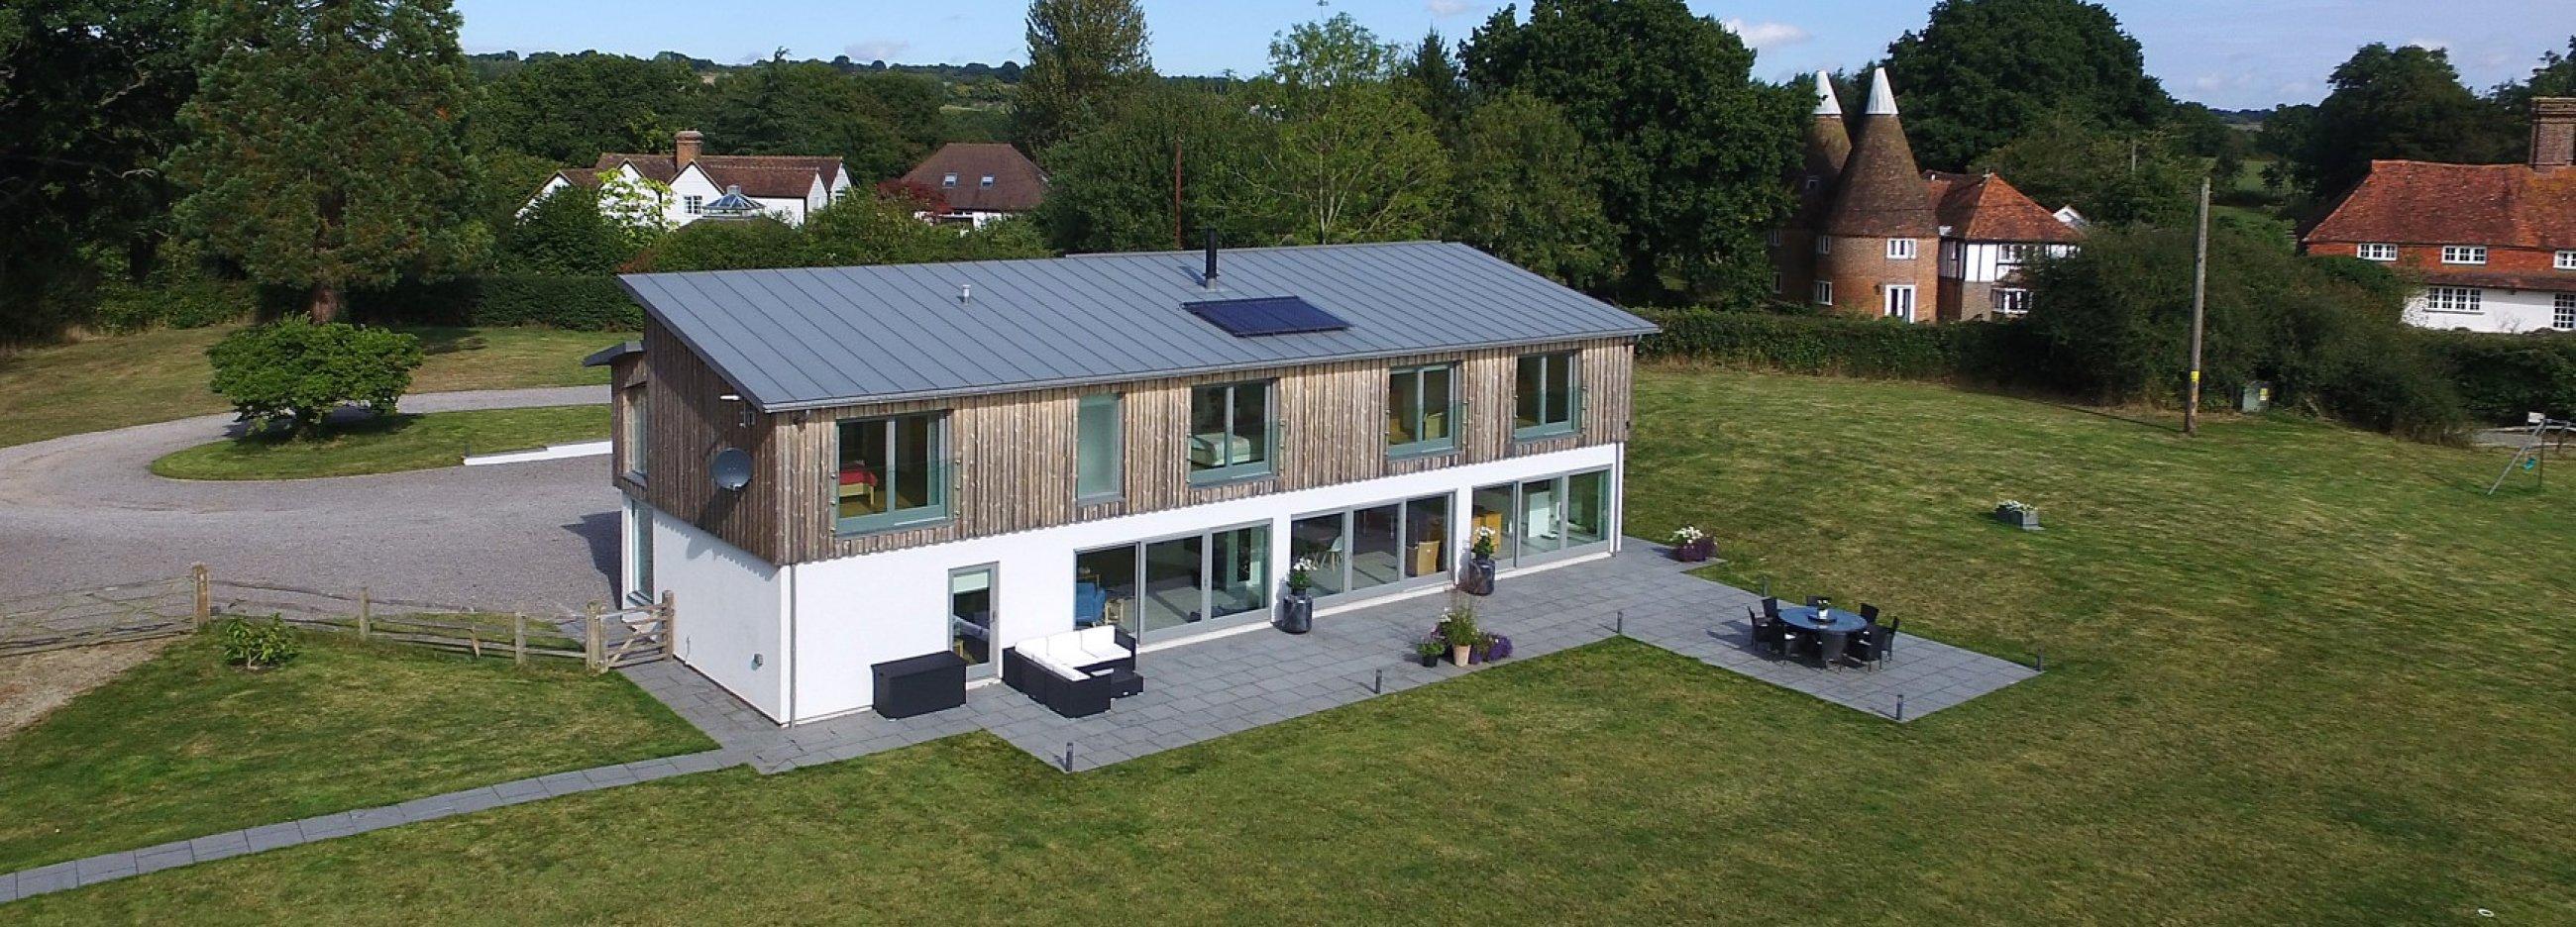 Scandinavian style houses for sale uk house design plans - Scandinavian houses ...